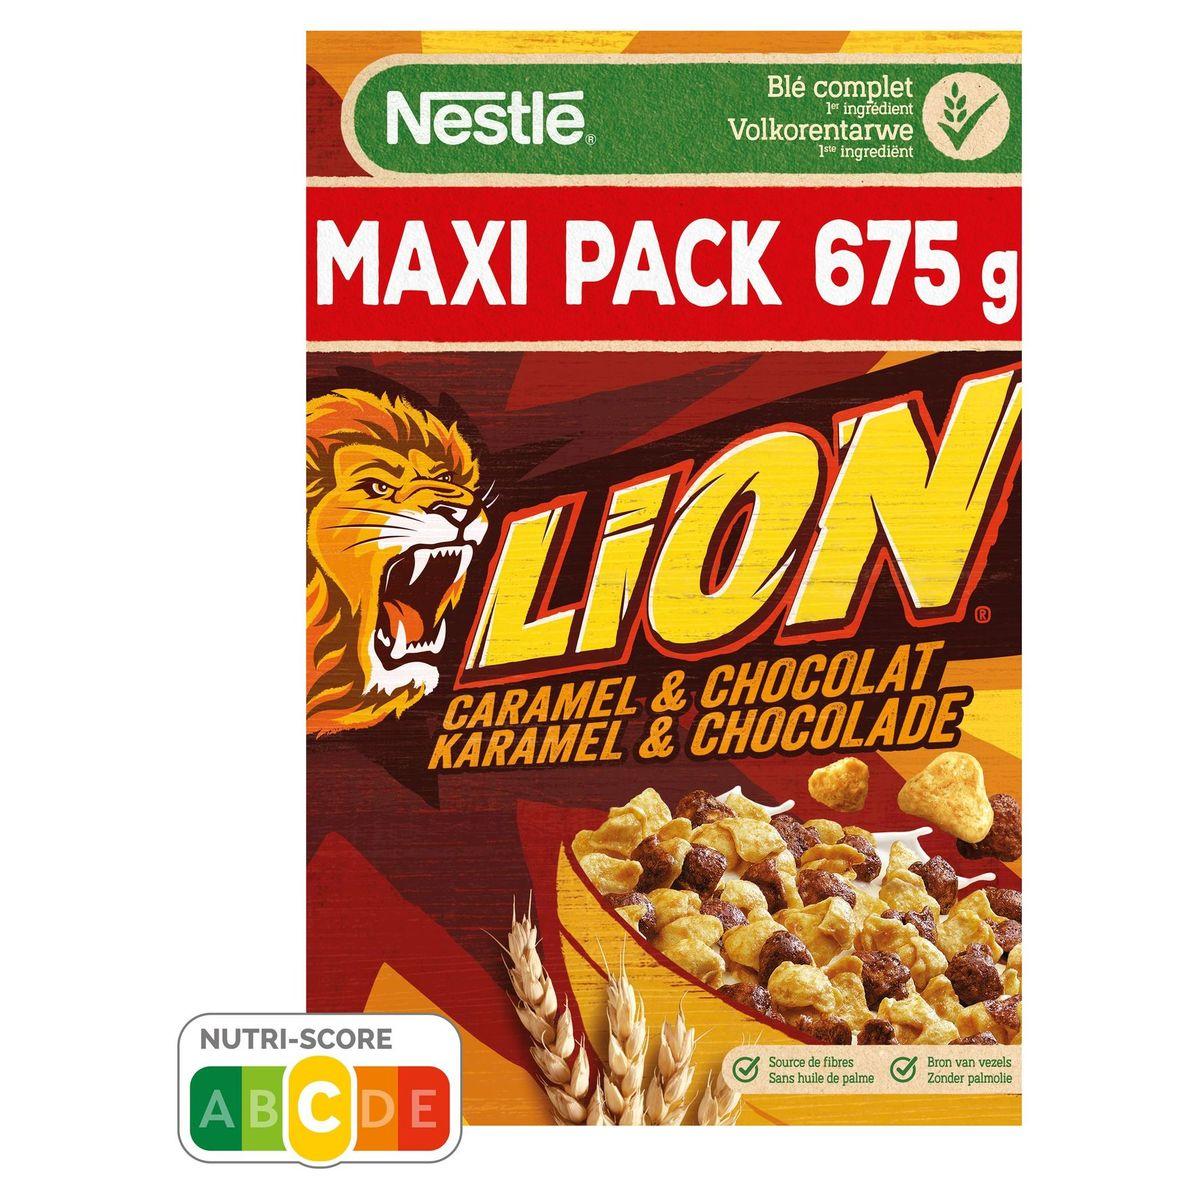 Lion Caramel & Chocolate Maxi Pack 675 g